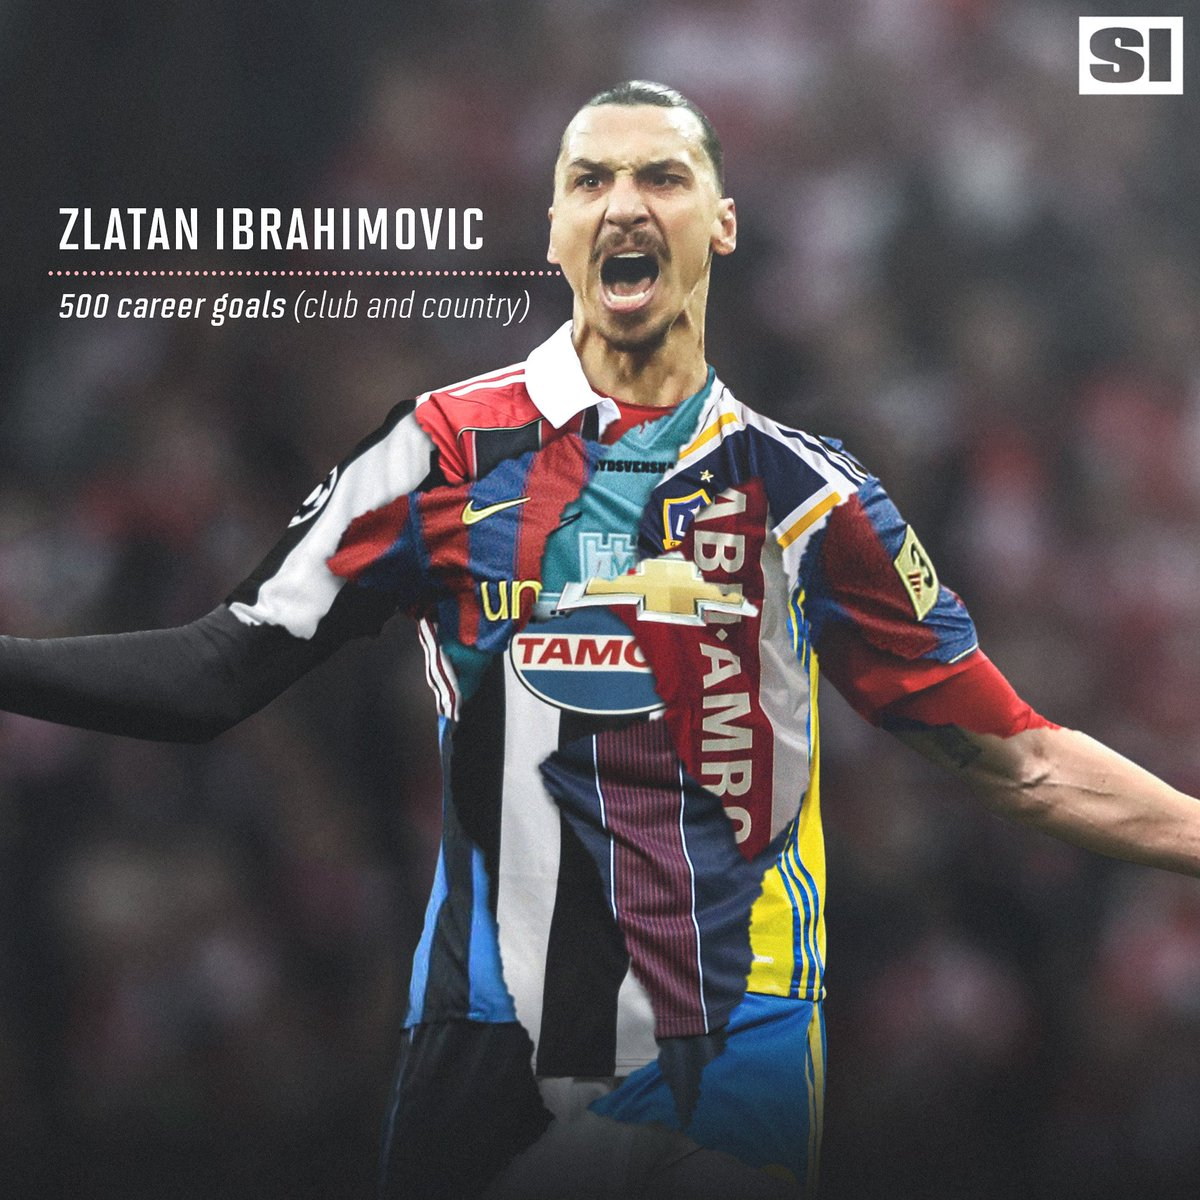 Zlatan500 Zlatan Ibrahimovic Scores His 500th Career Goal